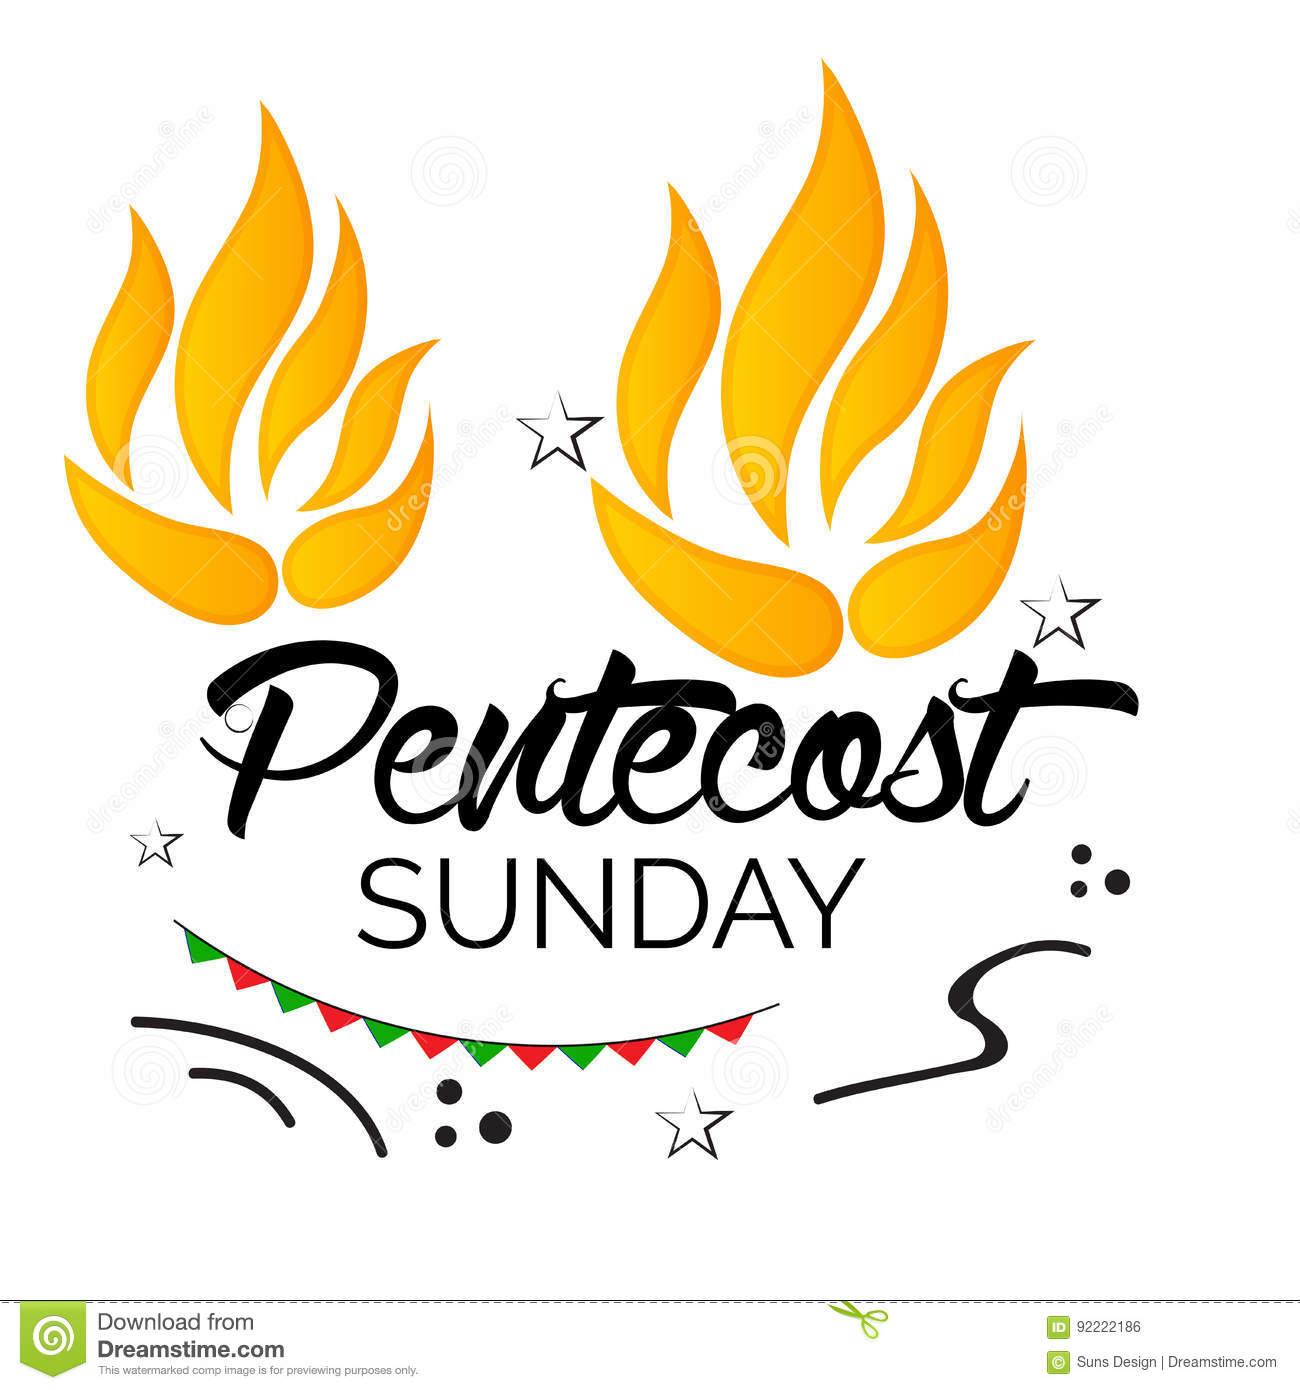 Pentecost sunday clipart 4 » Clipart Station.